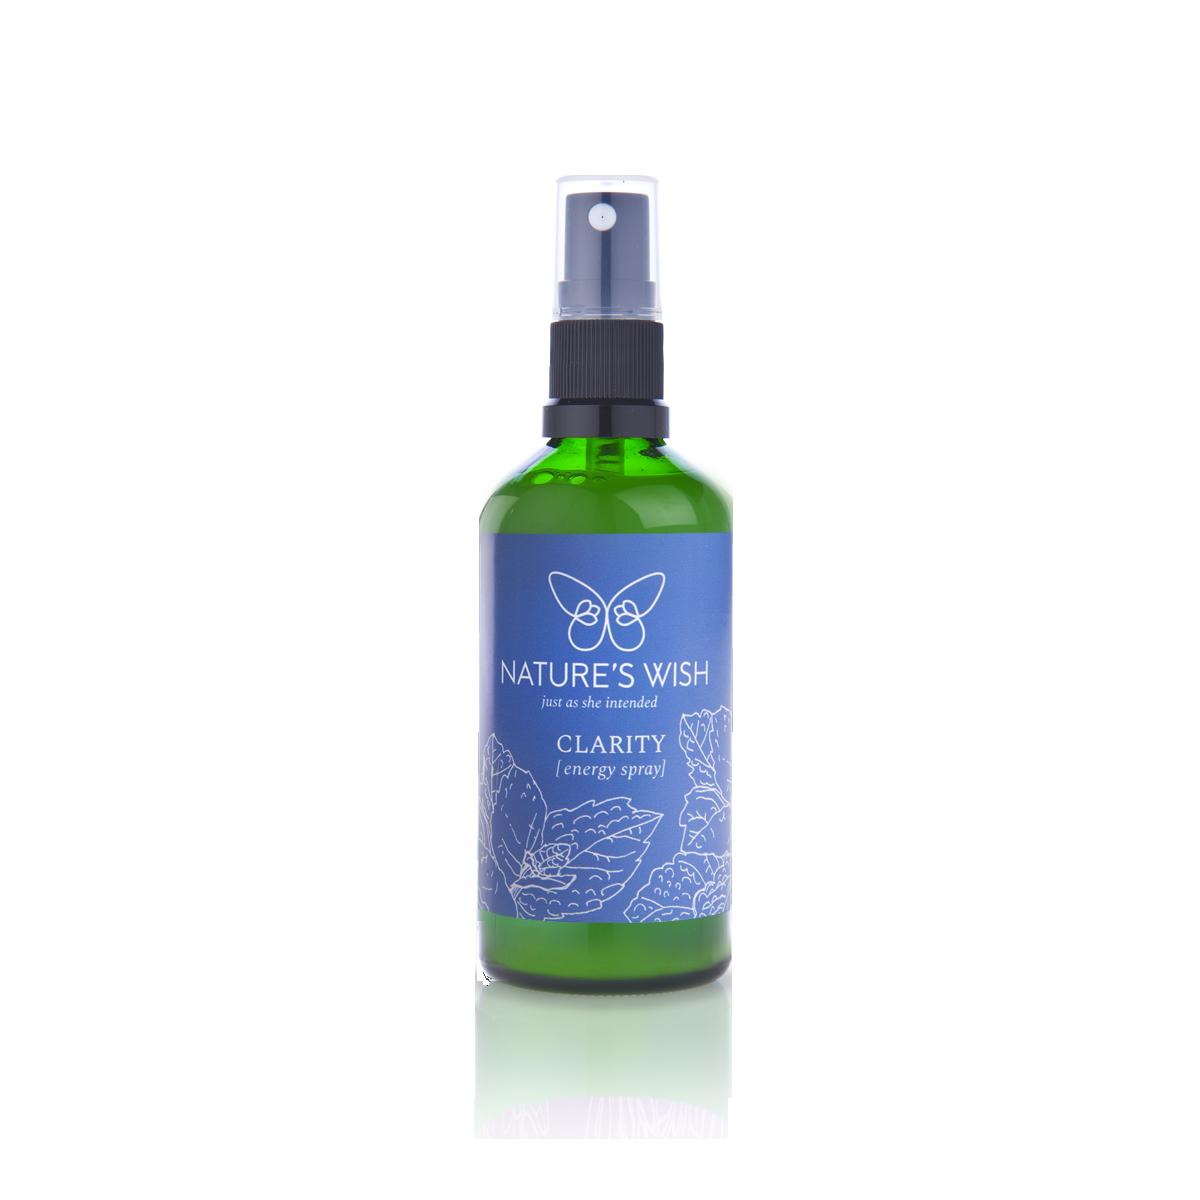 black-pepper-peppermint-bergamot-palmarosa-black-tourmaline-daisy-white-chestnut-flower-essence-aromatherapy-energy-spray